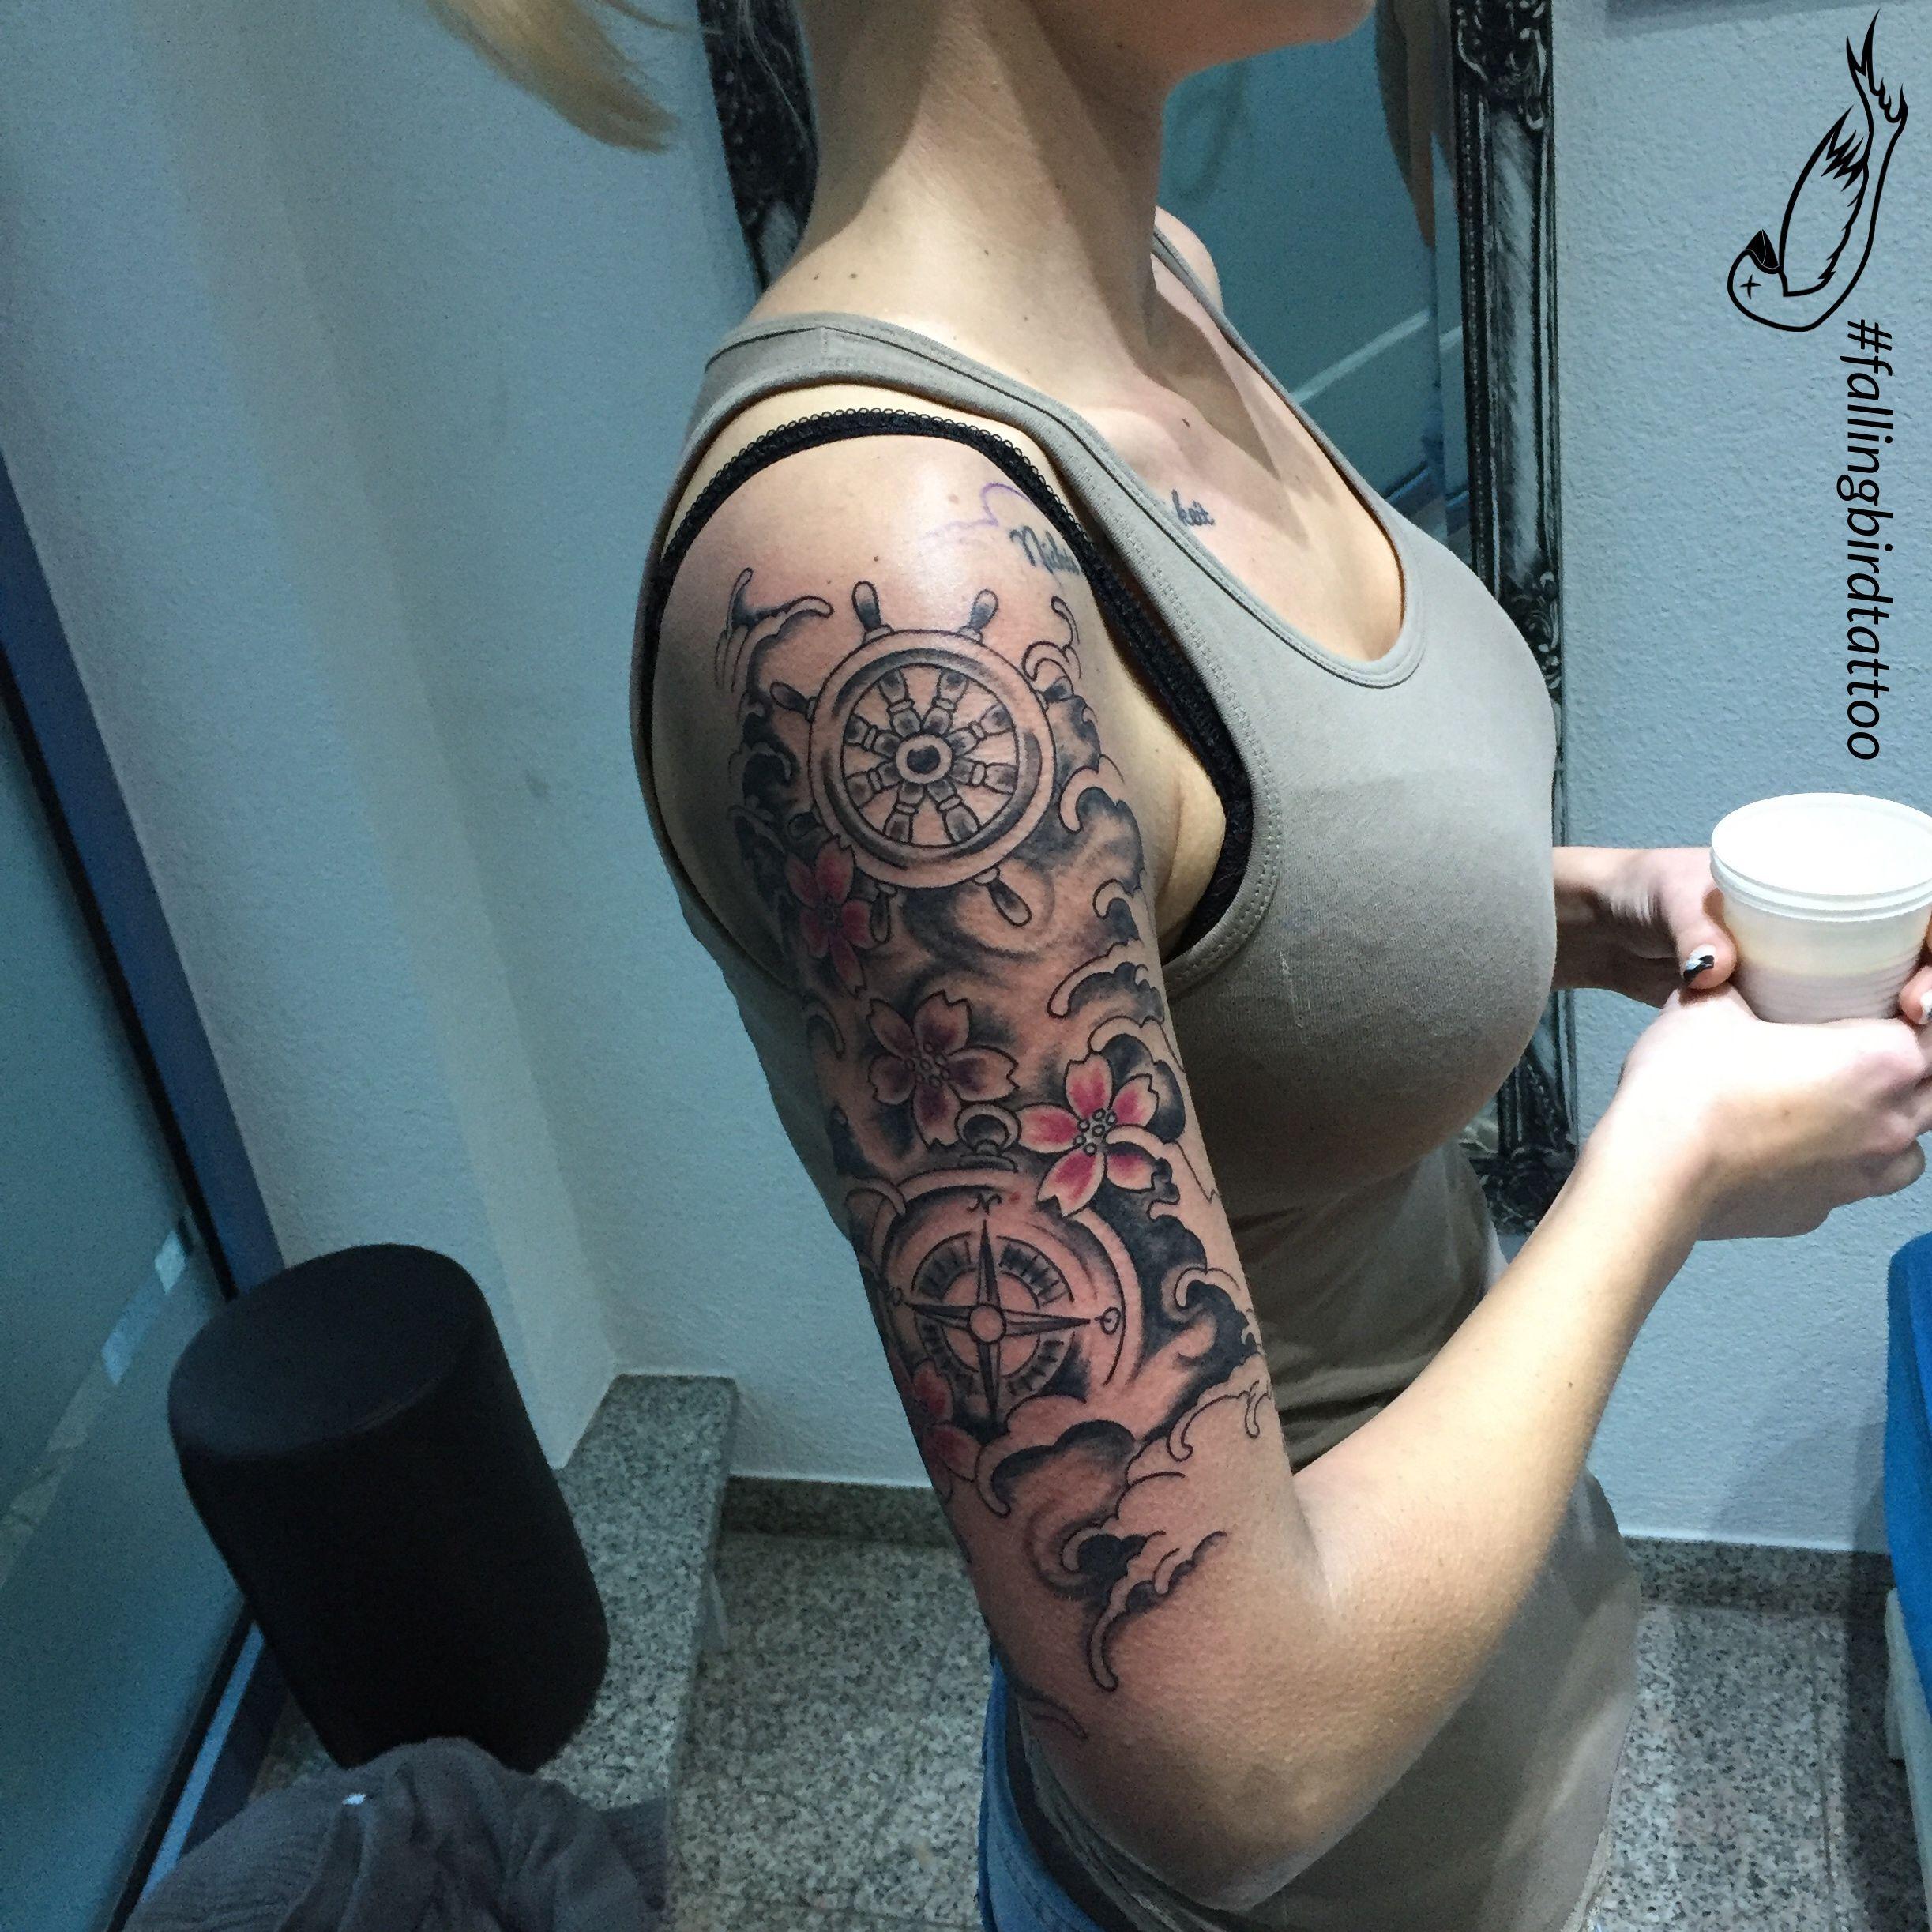 1274278d2 Anker / Anchor Tattoo compass Wave Kompass Falling Bird Tattoo studio Tattoo